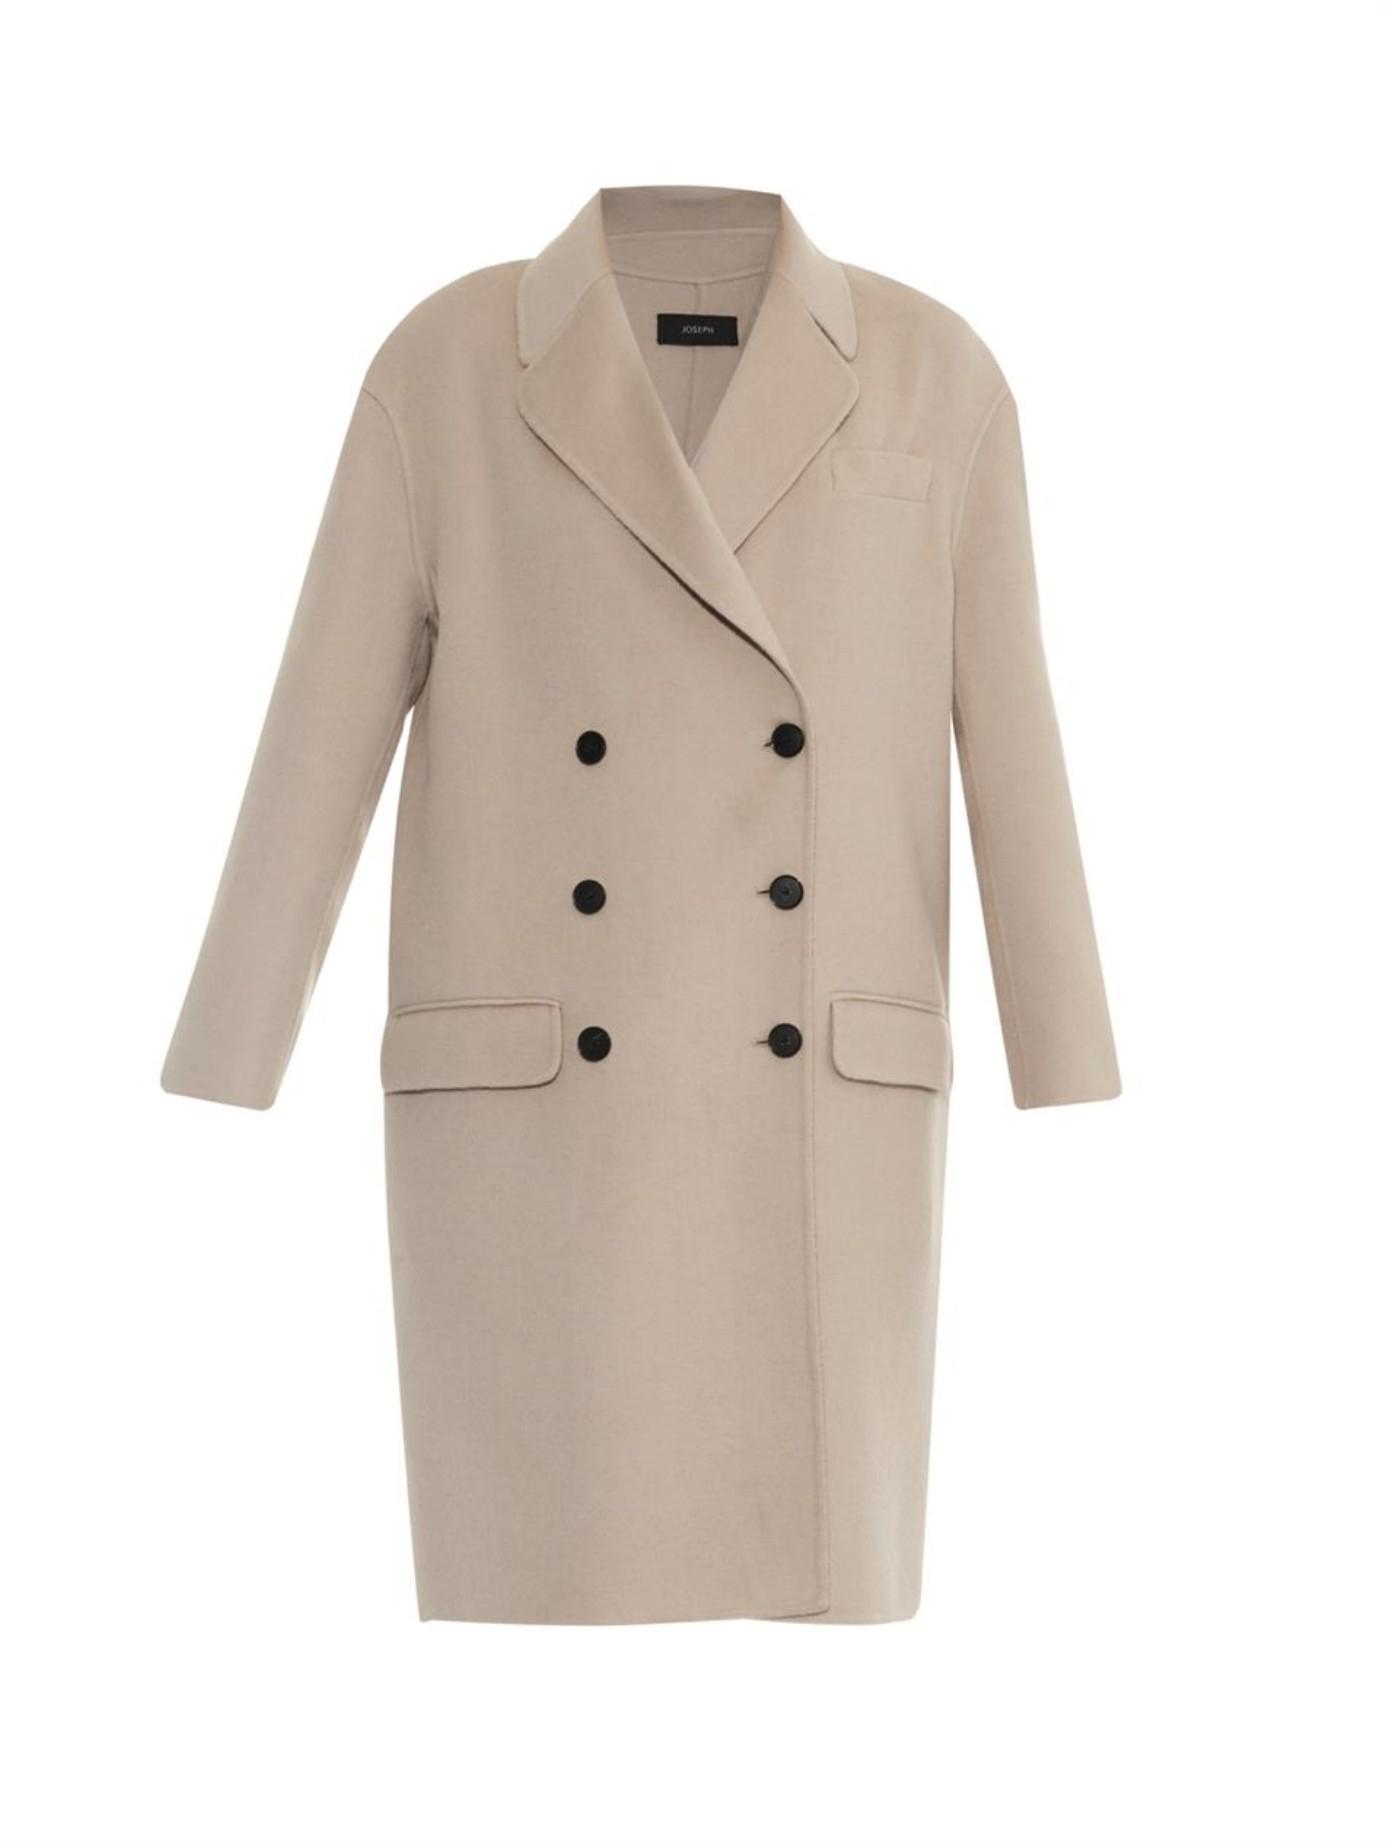 Joseph Shrimpton Cashmere-Blend Coat in Natural | Lyst